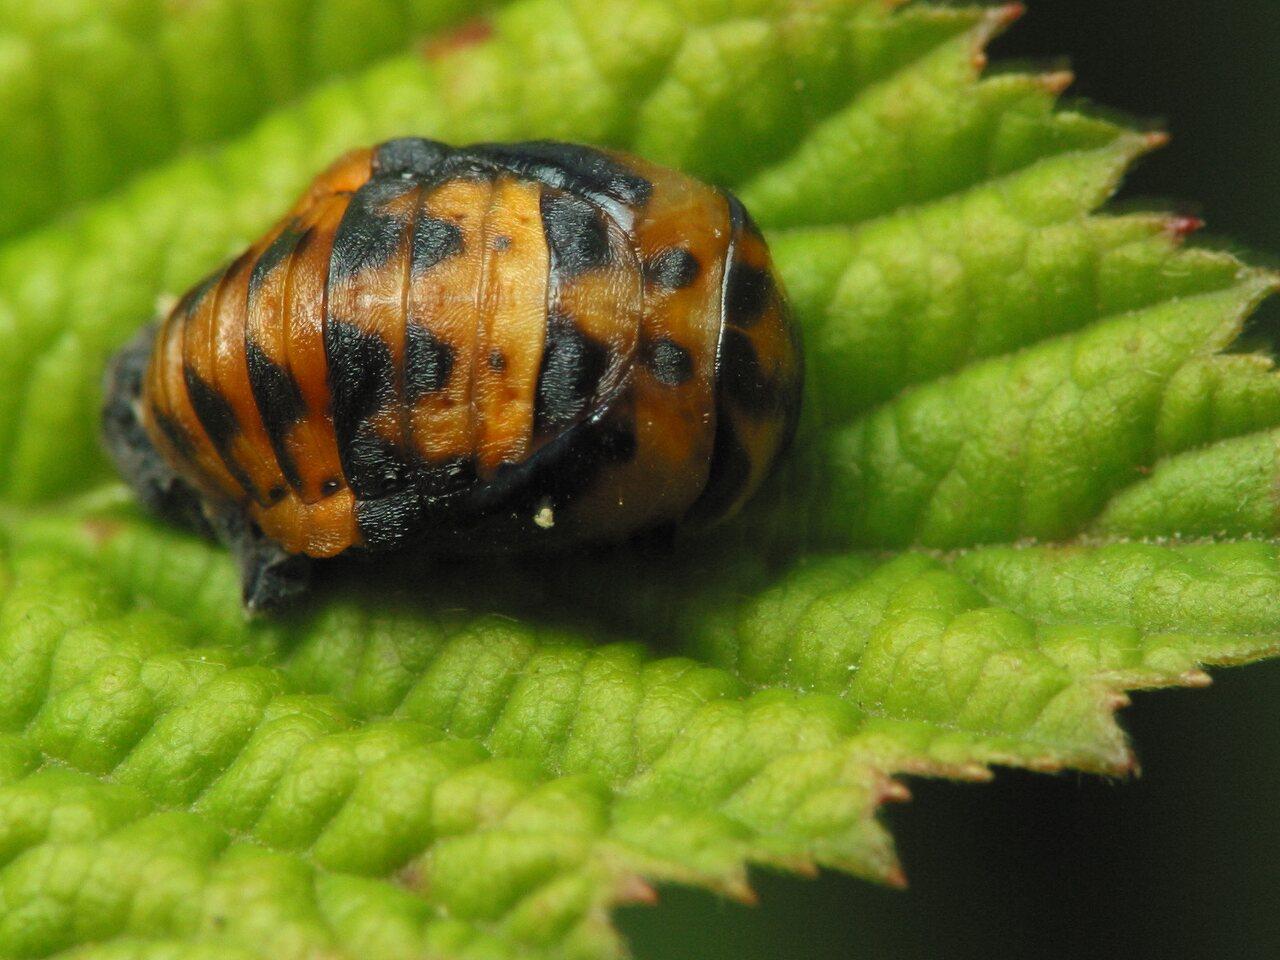 Coccinella-septempunctata-3072.jpg